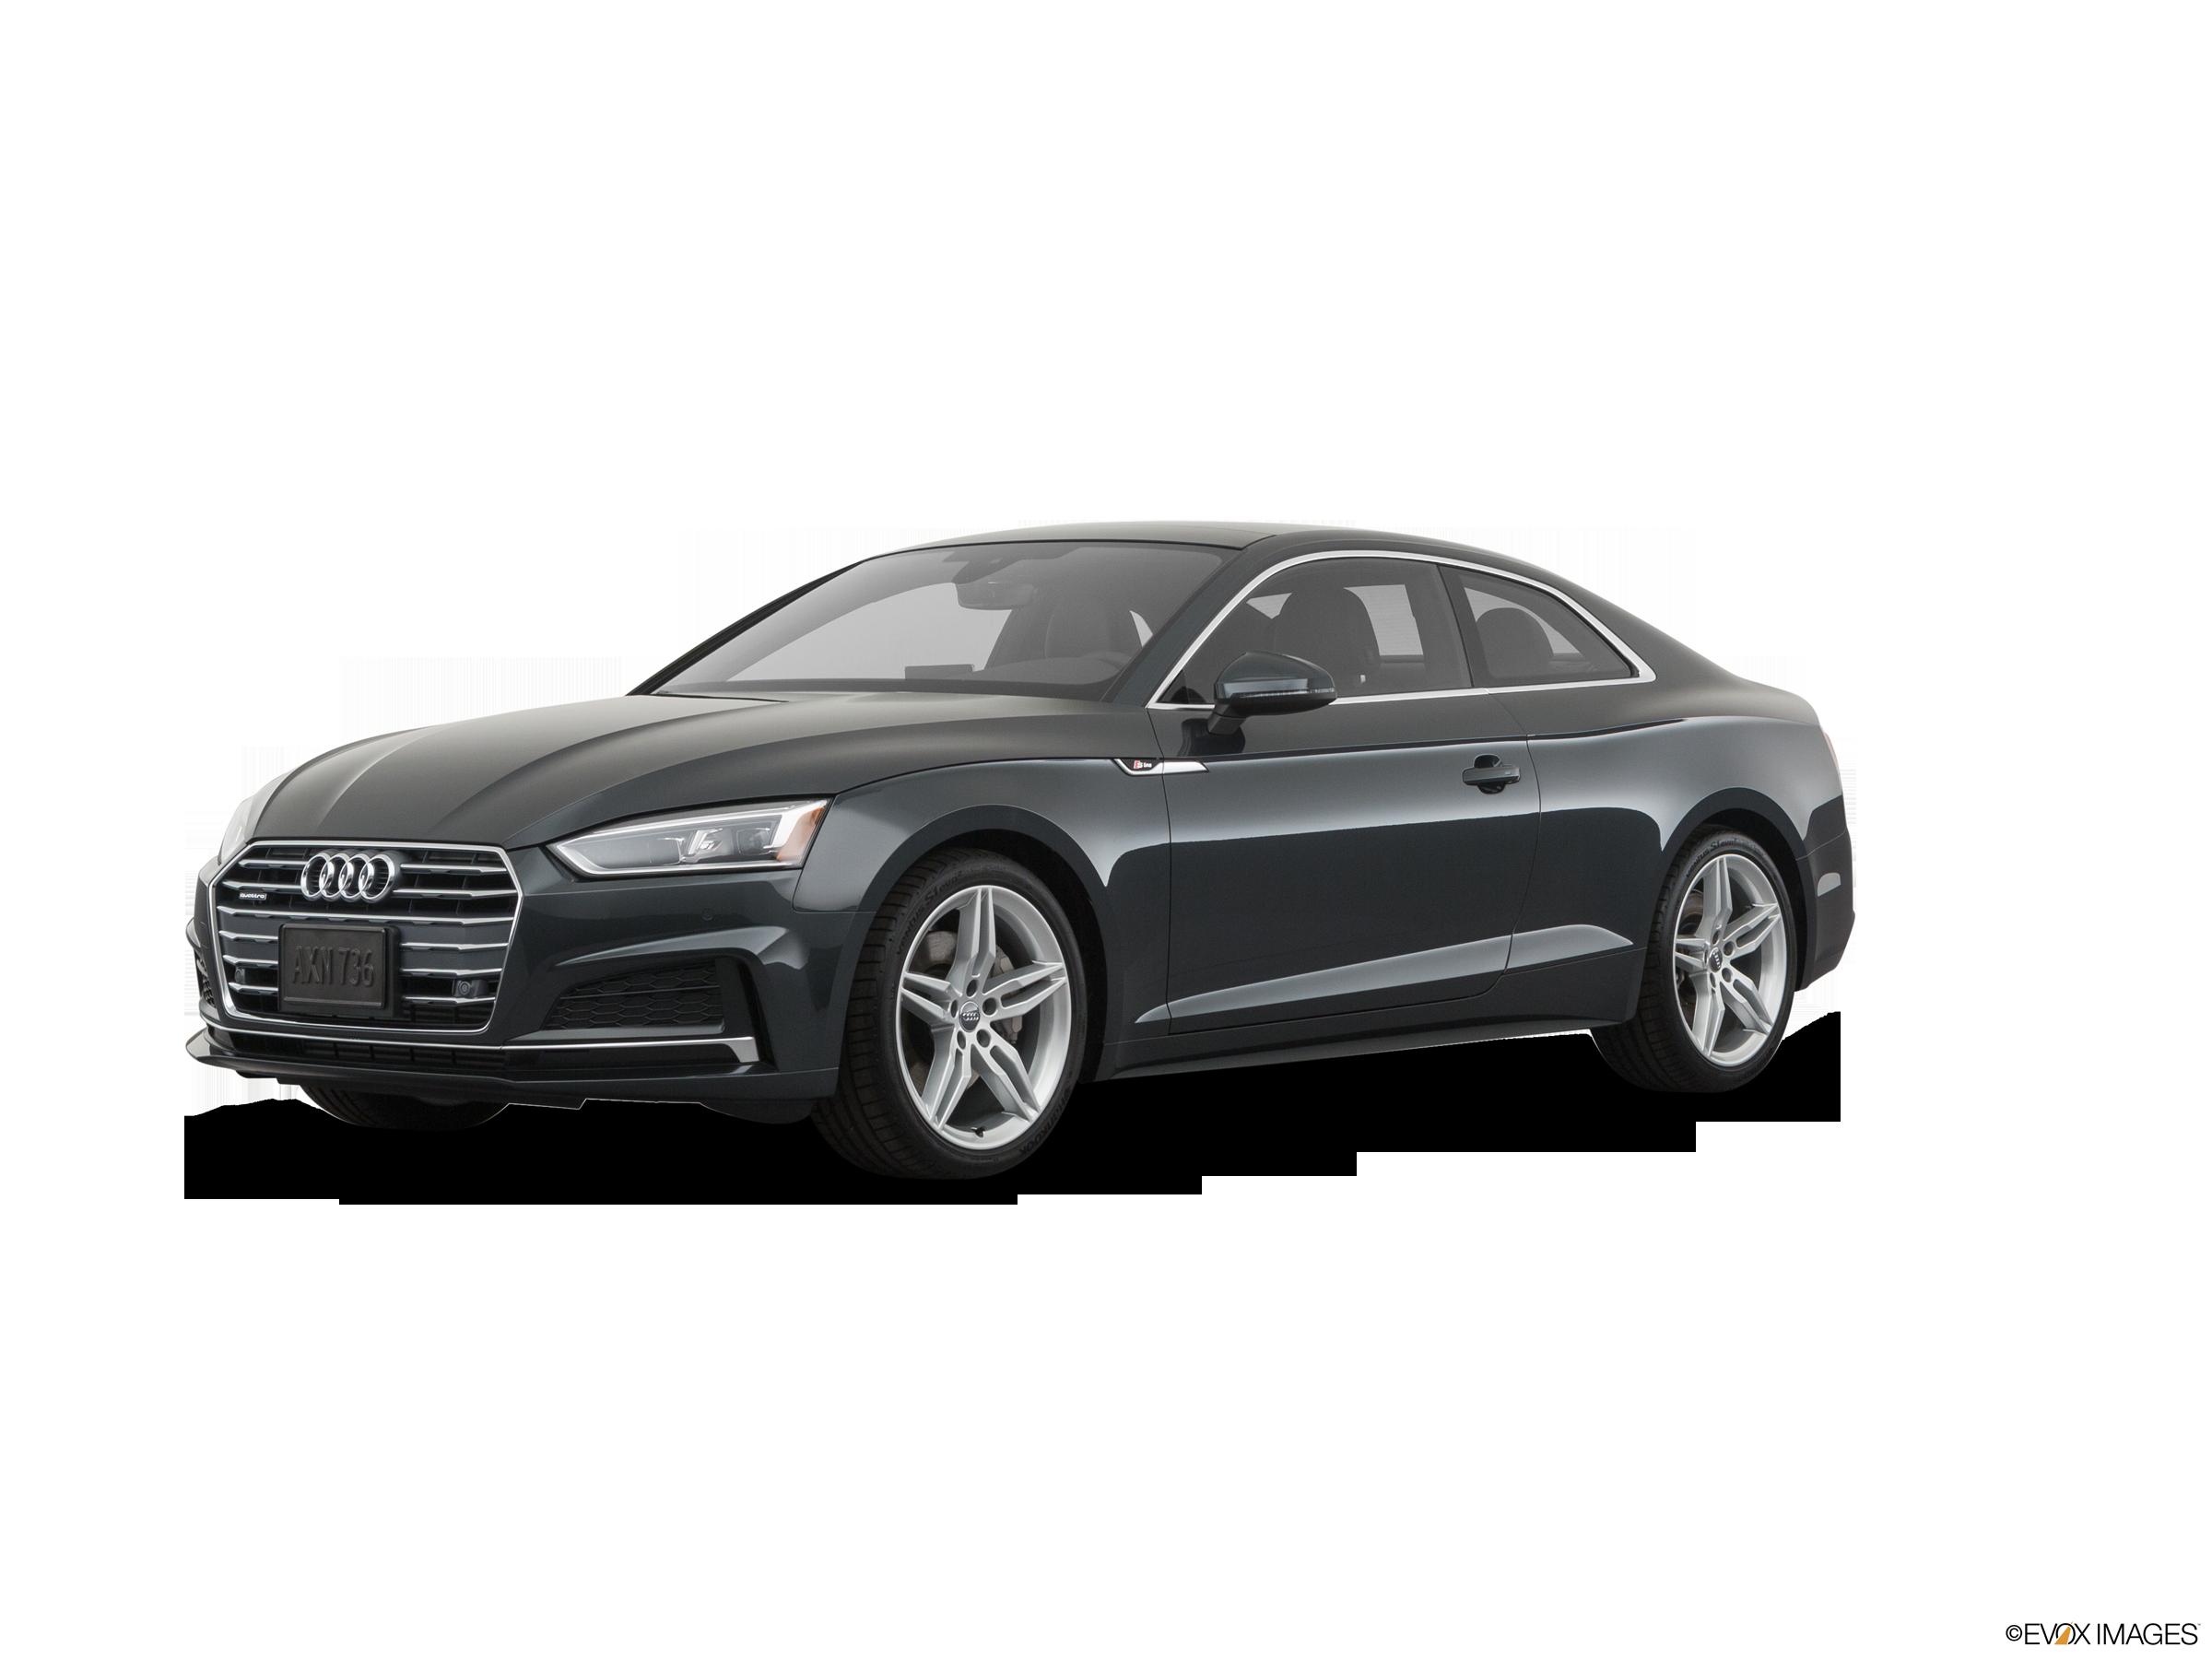 Kelebihan Audi A5 2019 Tangguh